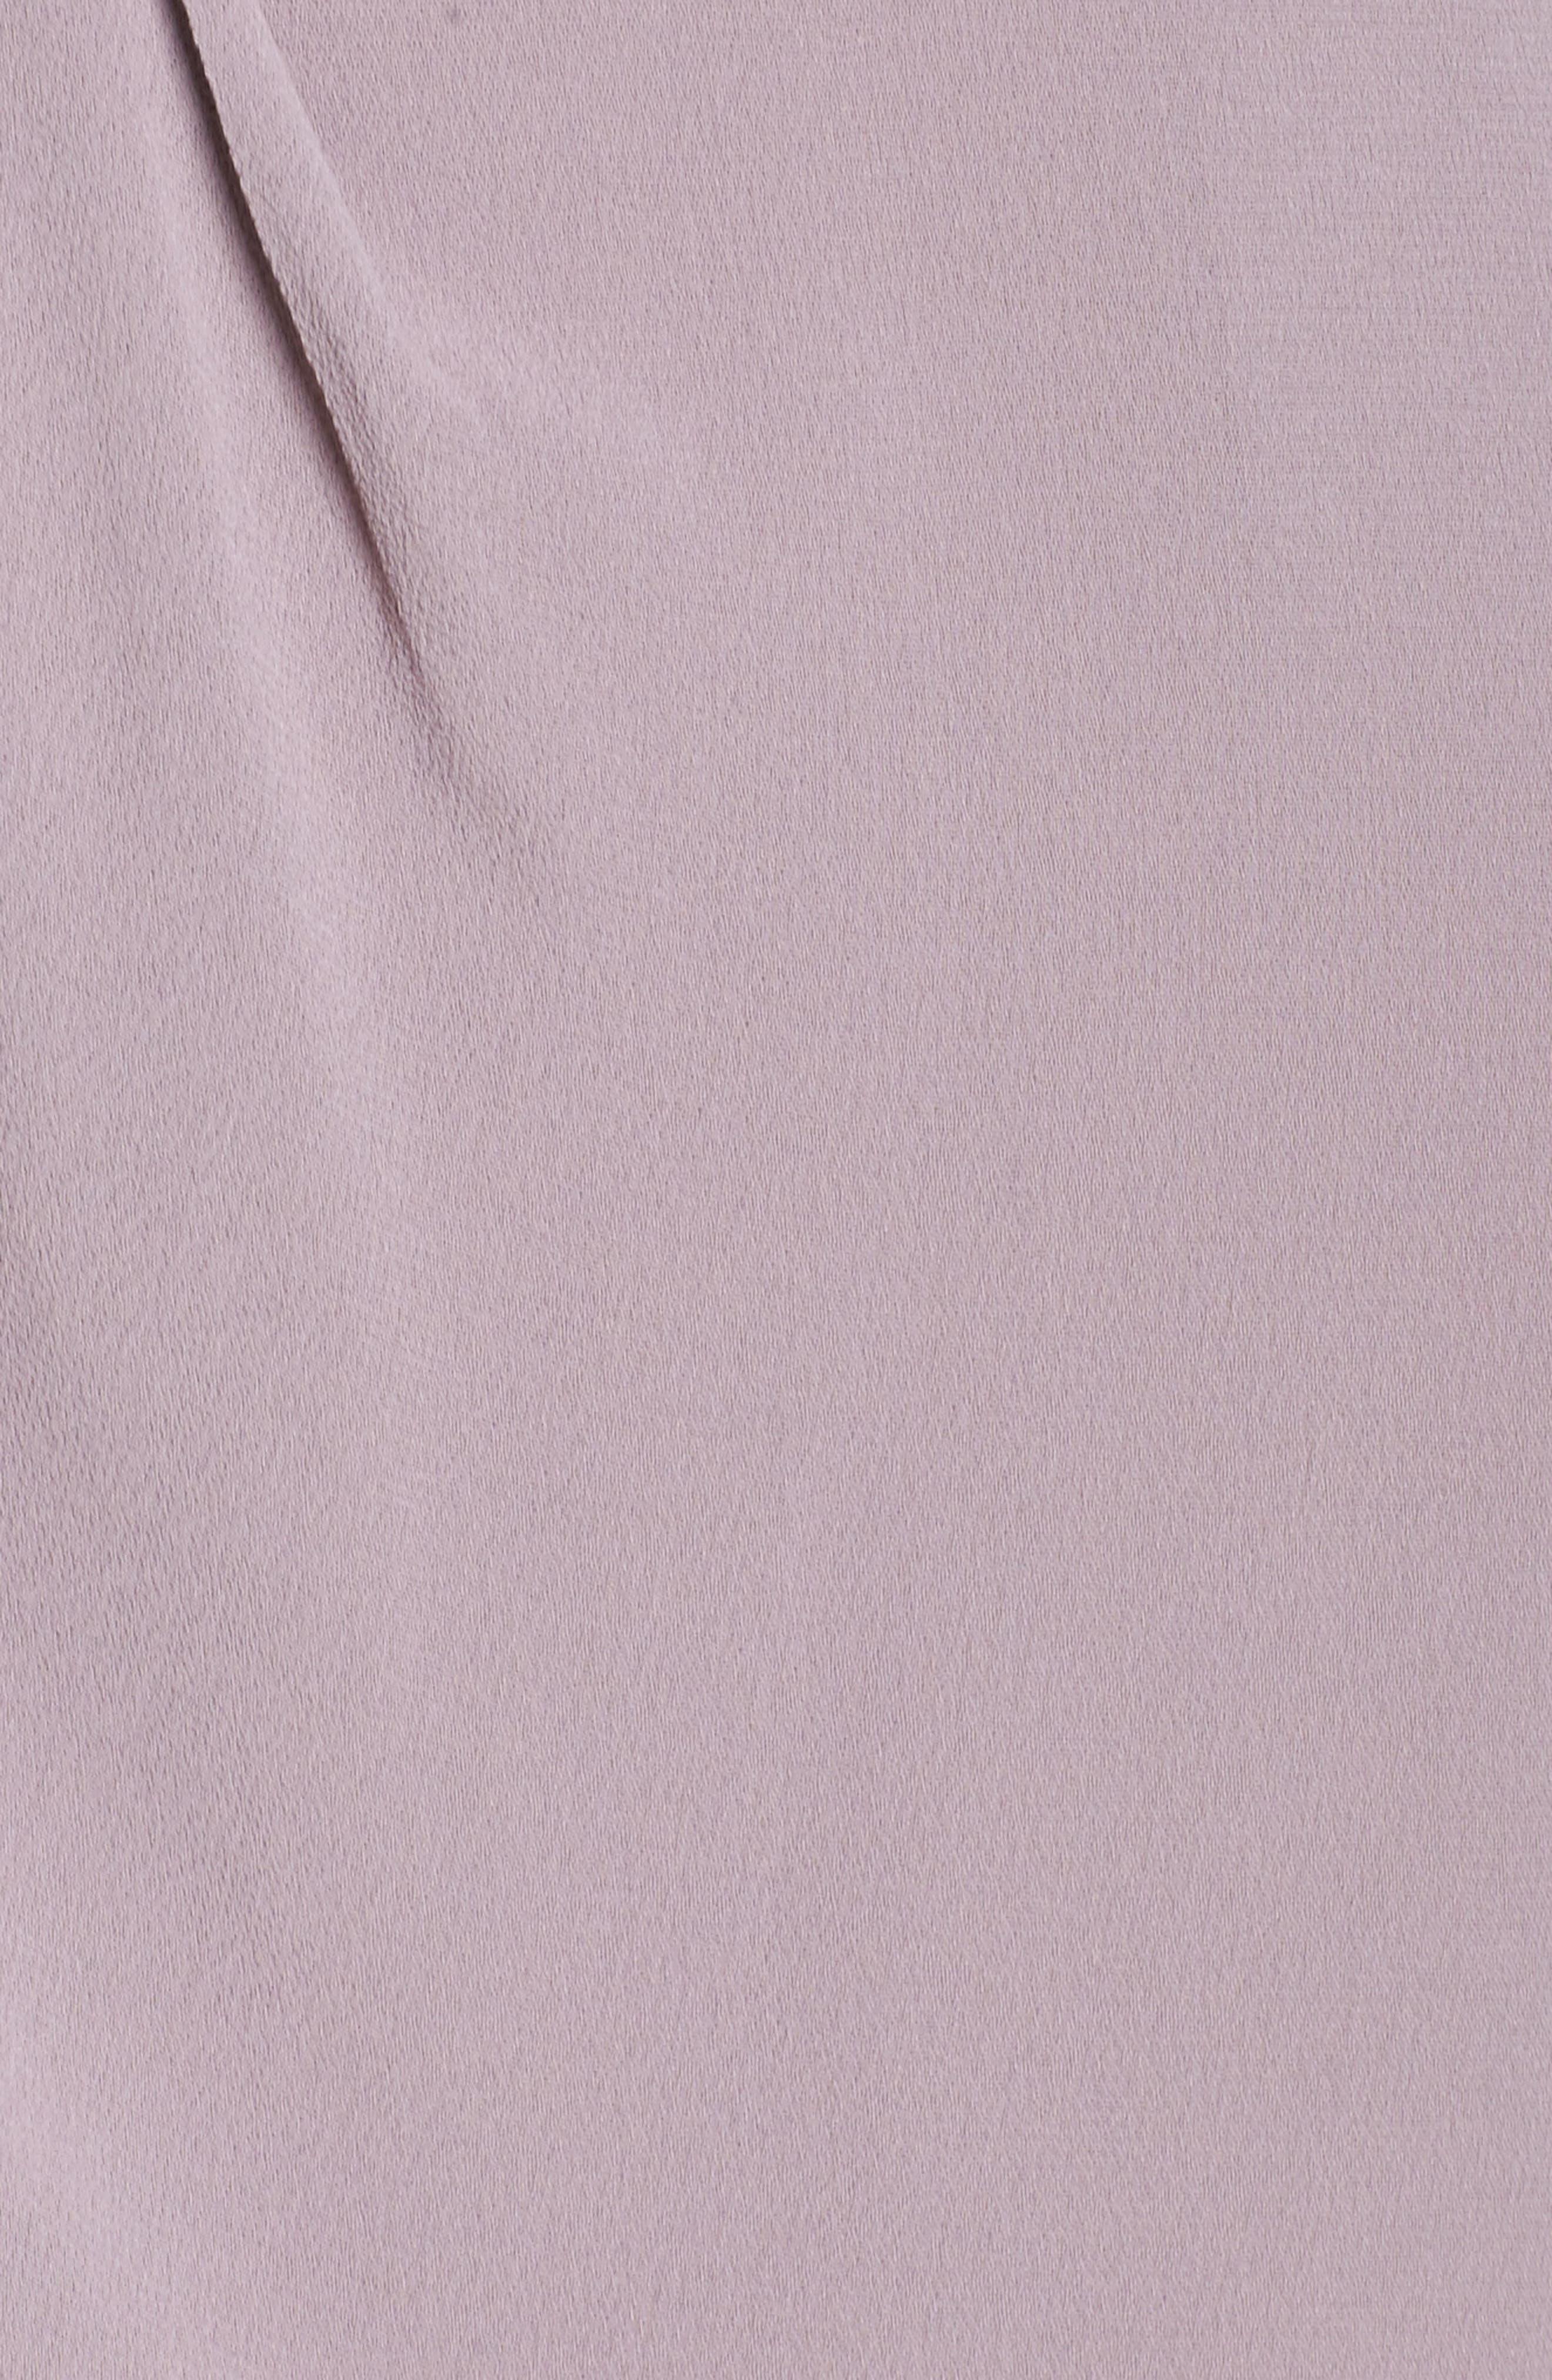 Stilla Asymmetric Drape Dress,                             Alternate thumbnail 5, color,